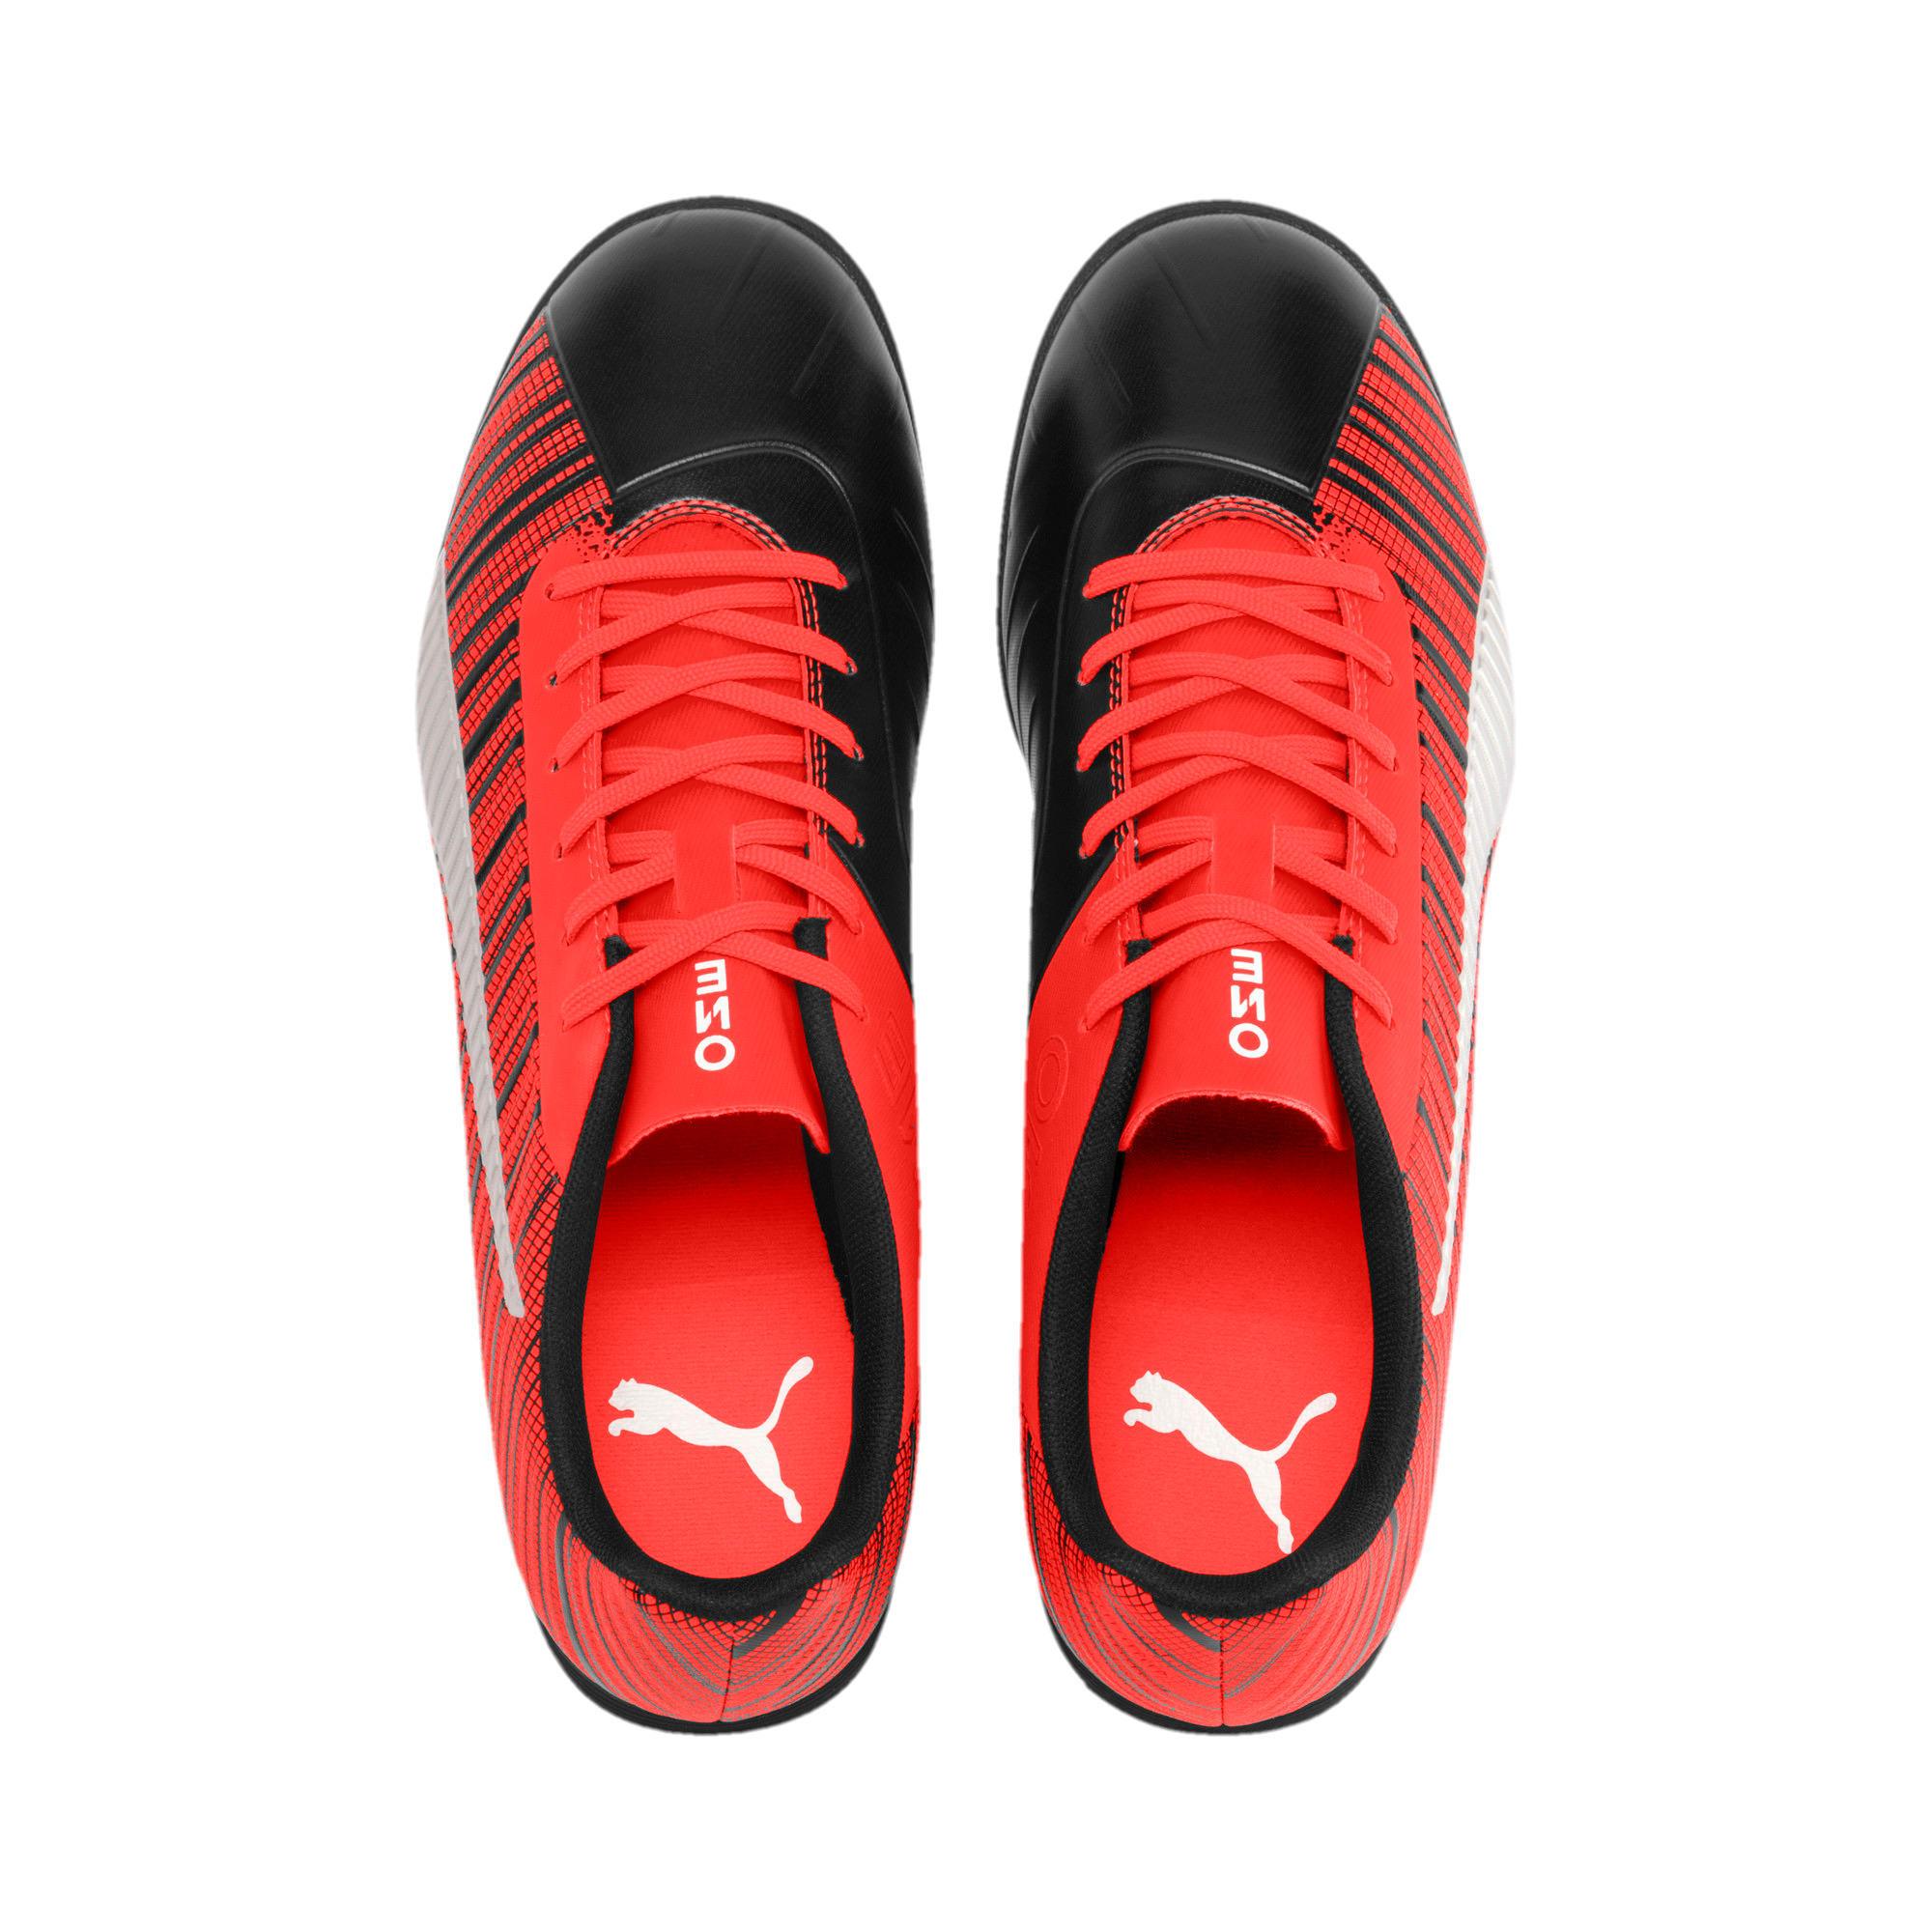 Thumbnail 7 of PUMA ONE 5.4 TT Men's Soccer Shoes, Black-Nrgy Red-Aged Silver, medium